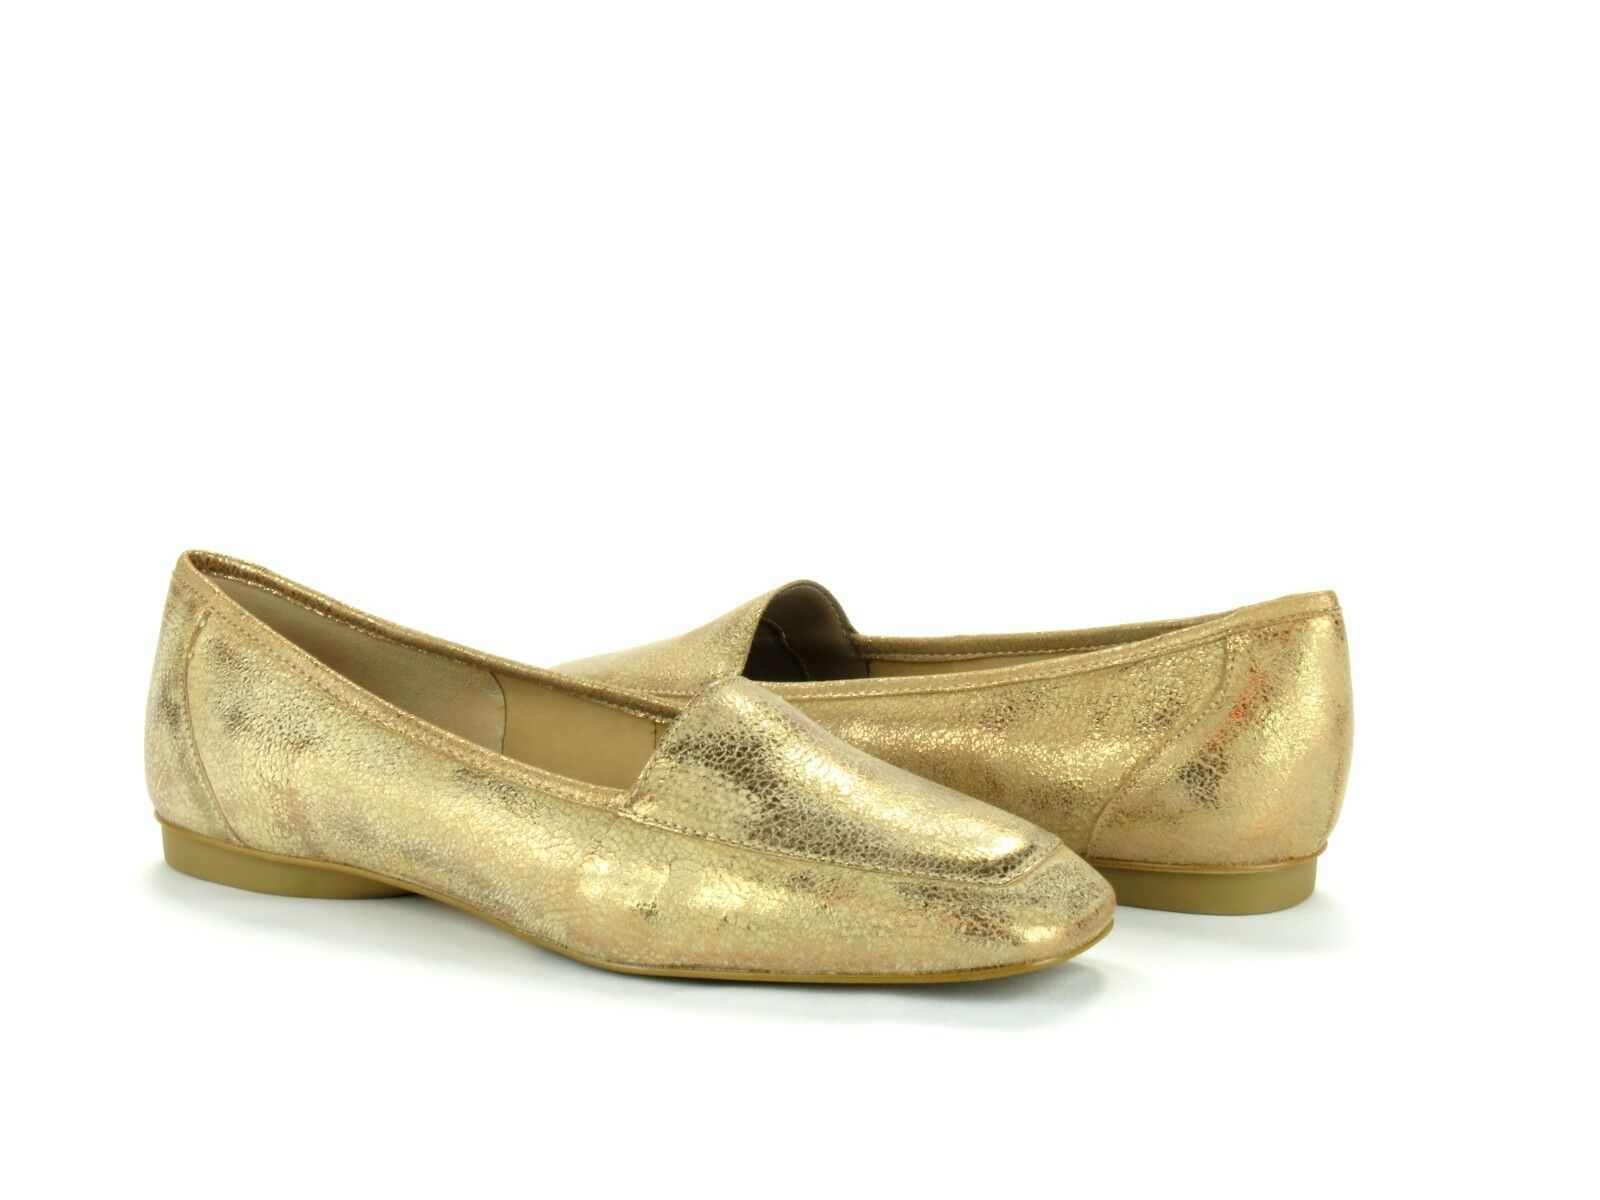 Donald J Pliner Deedee Bronze Metallic Tumbled Leather Slip On Loafer Flat 6